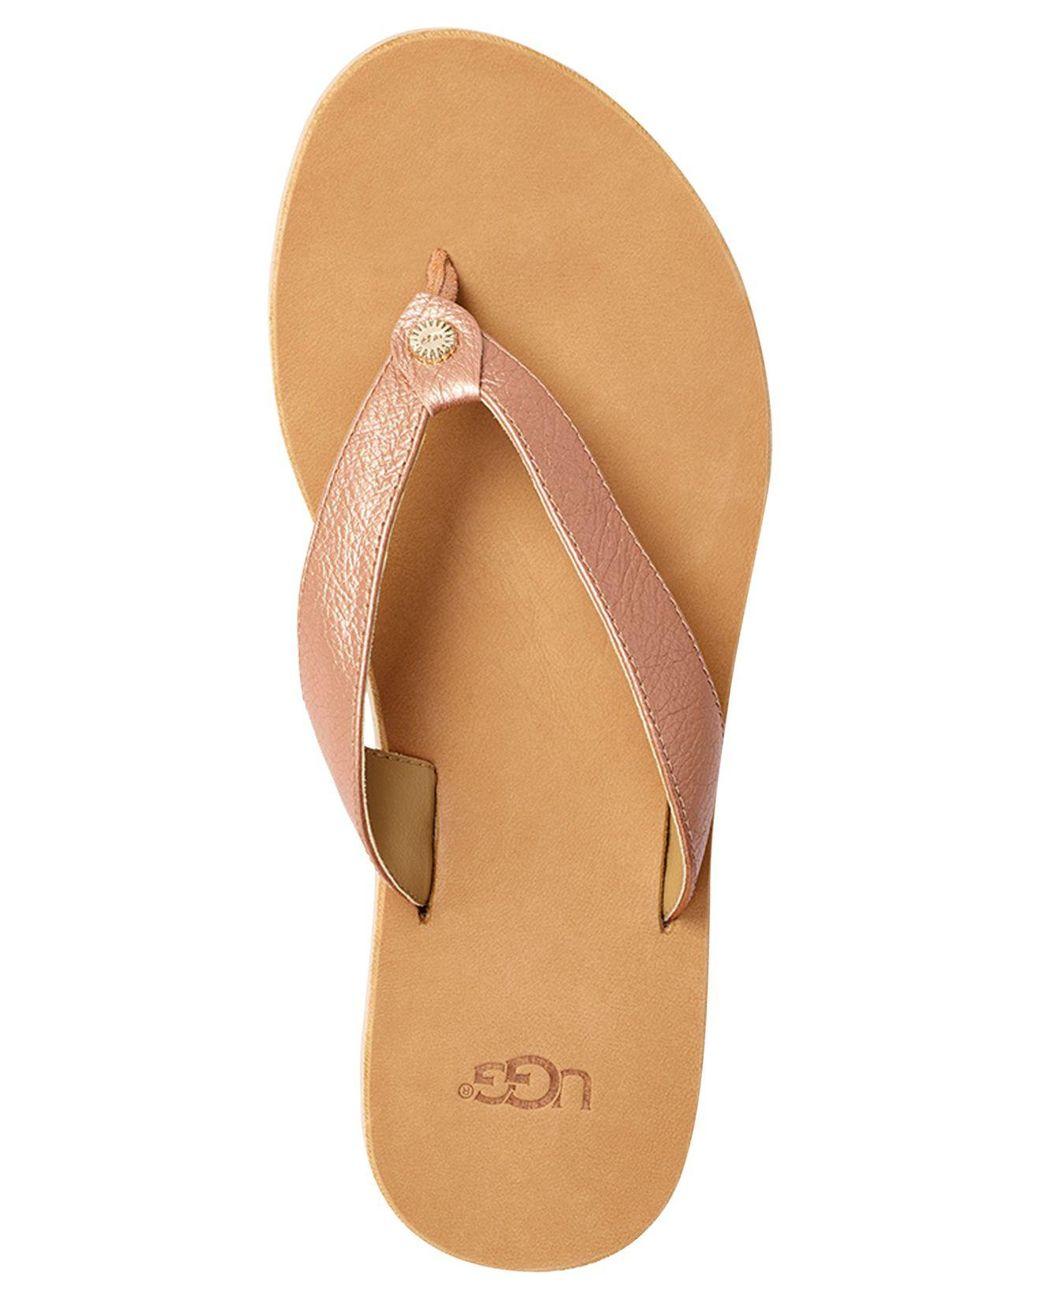 8ca10f171c4 Women's Pink Tawney Flip-flop Sandals